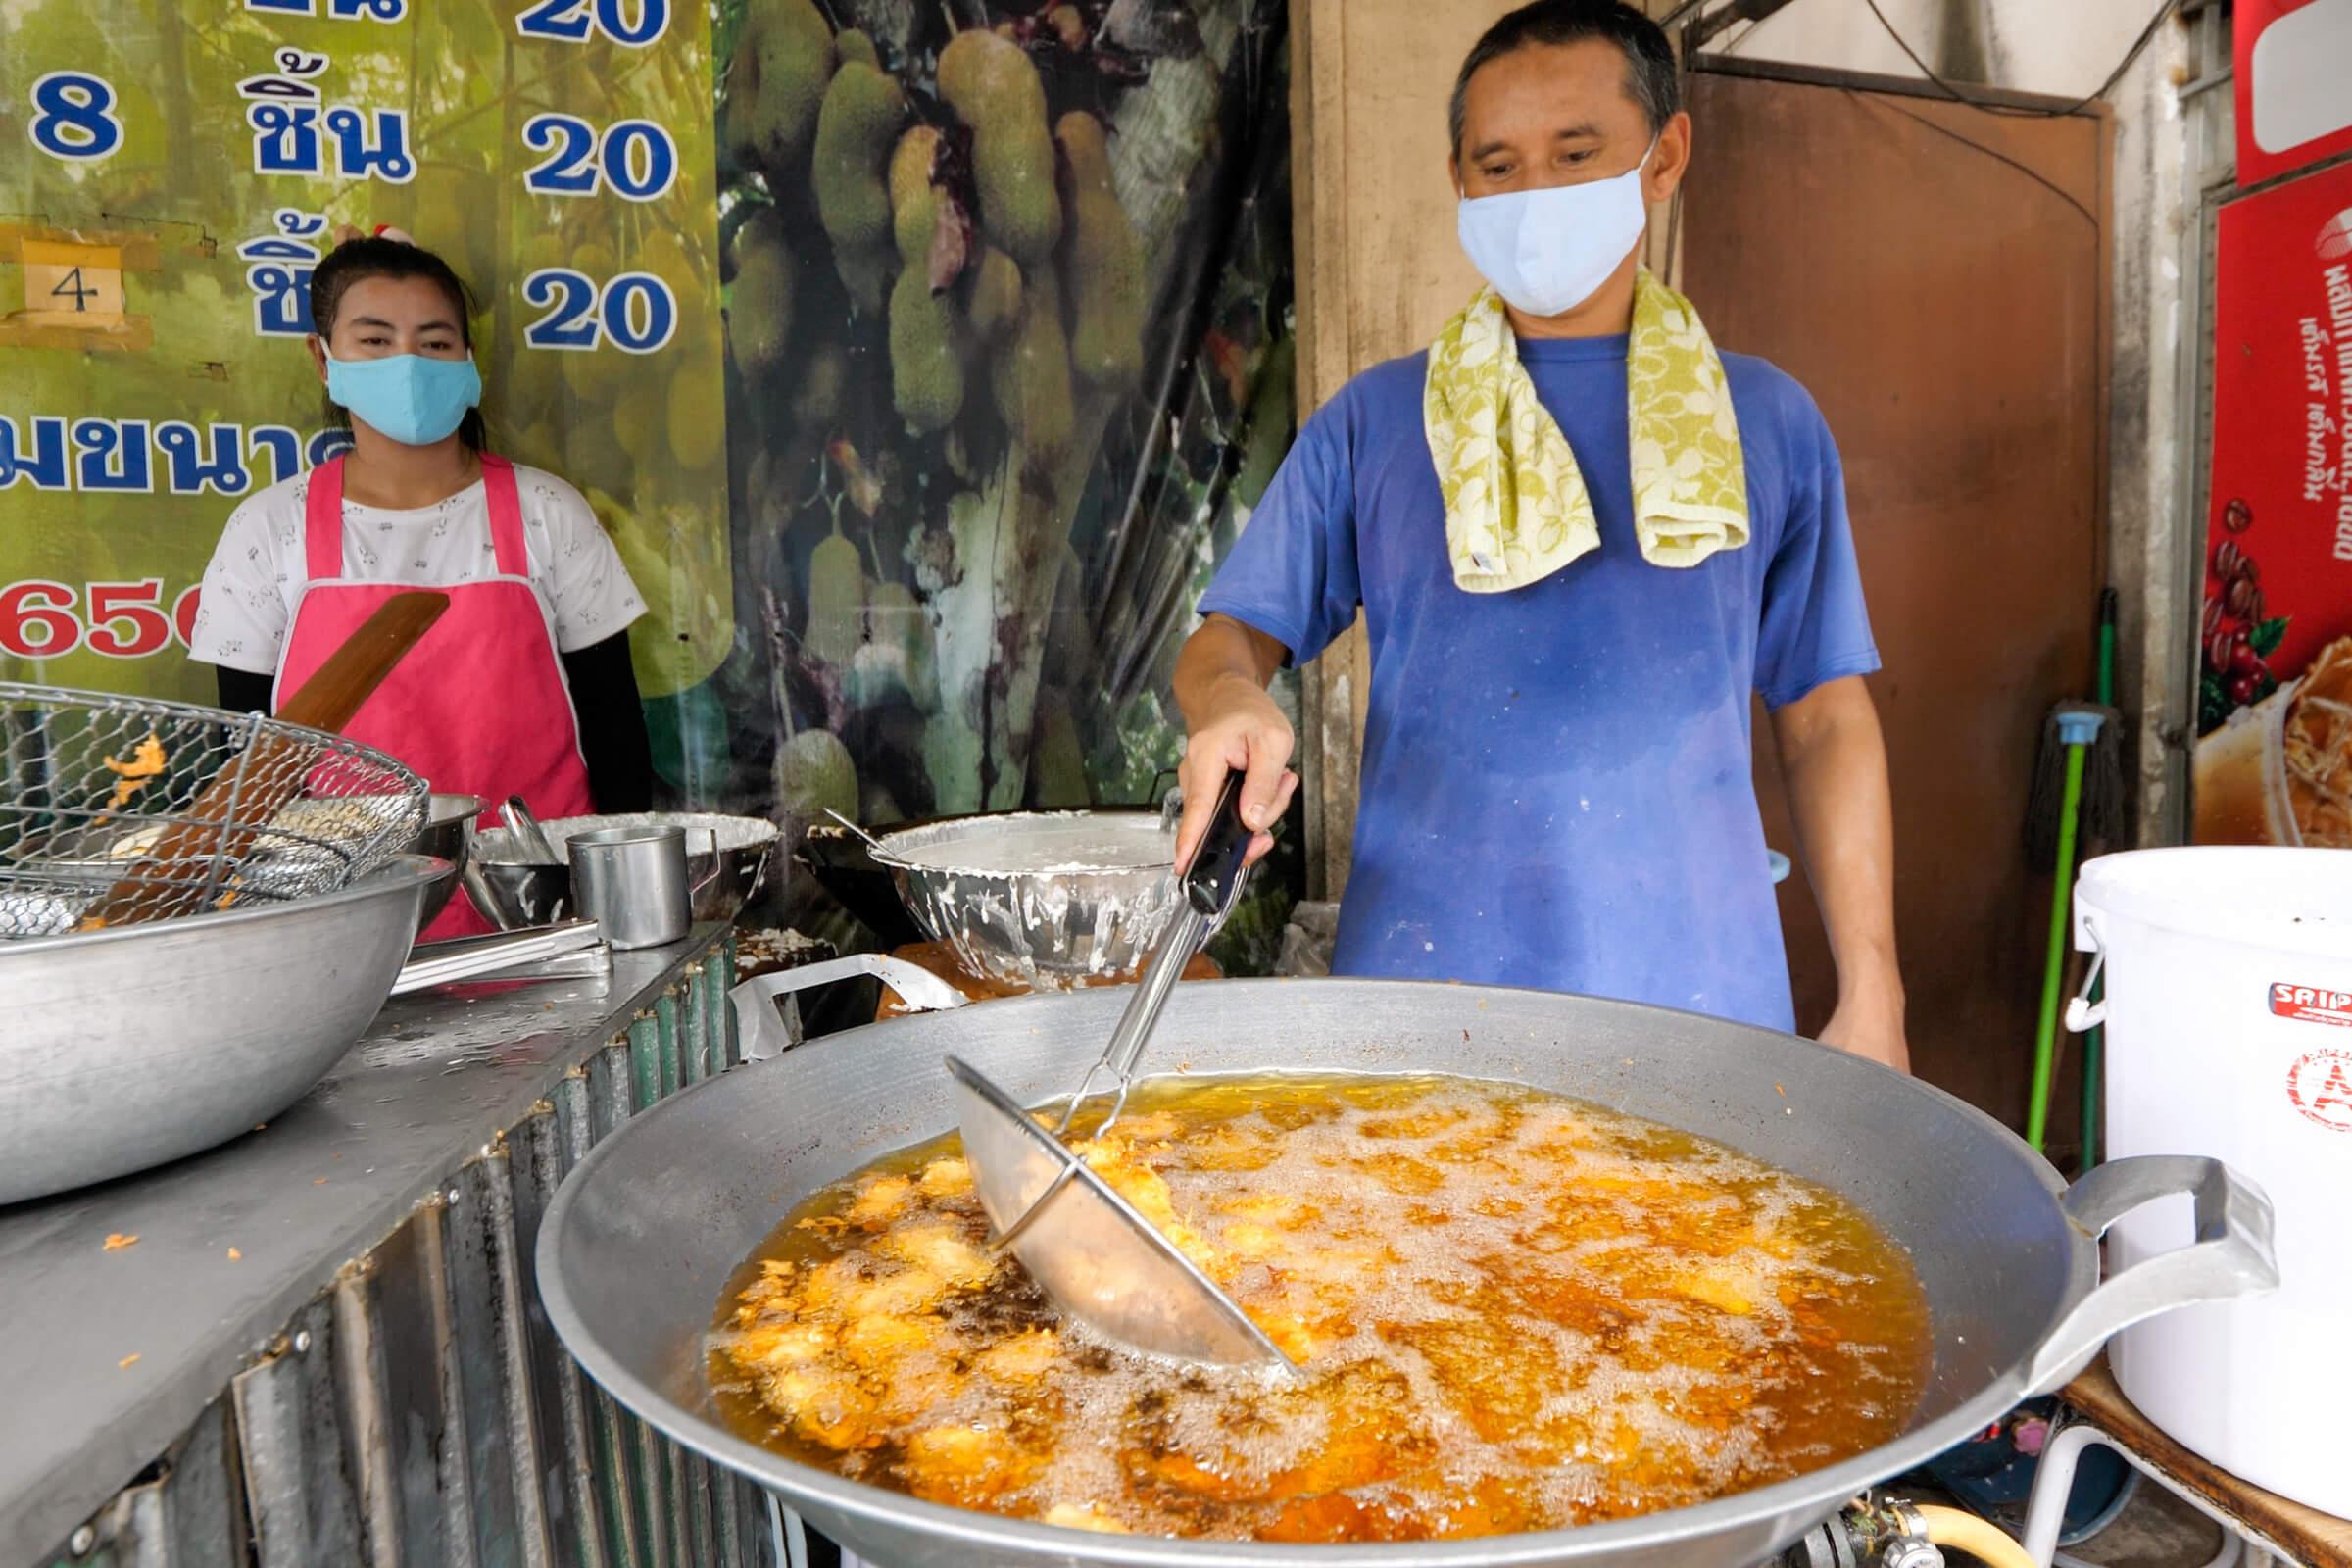 Cham Cha Market Fried Bananas (กล้วยทอดฉำฉา)